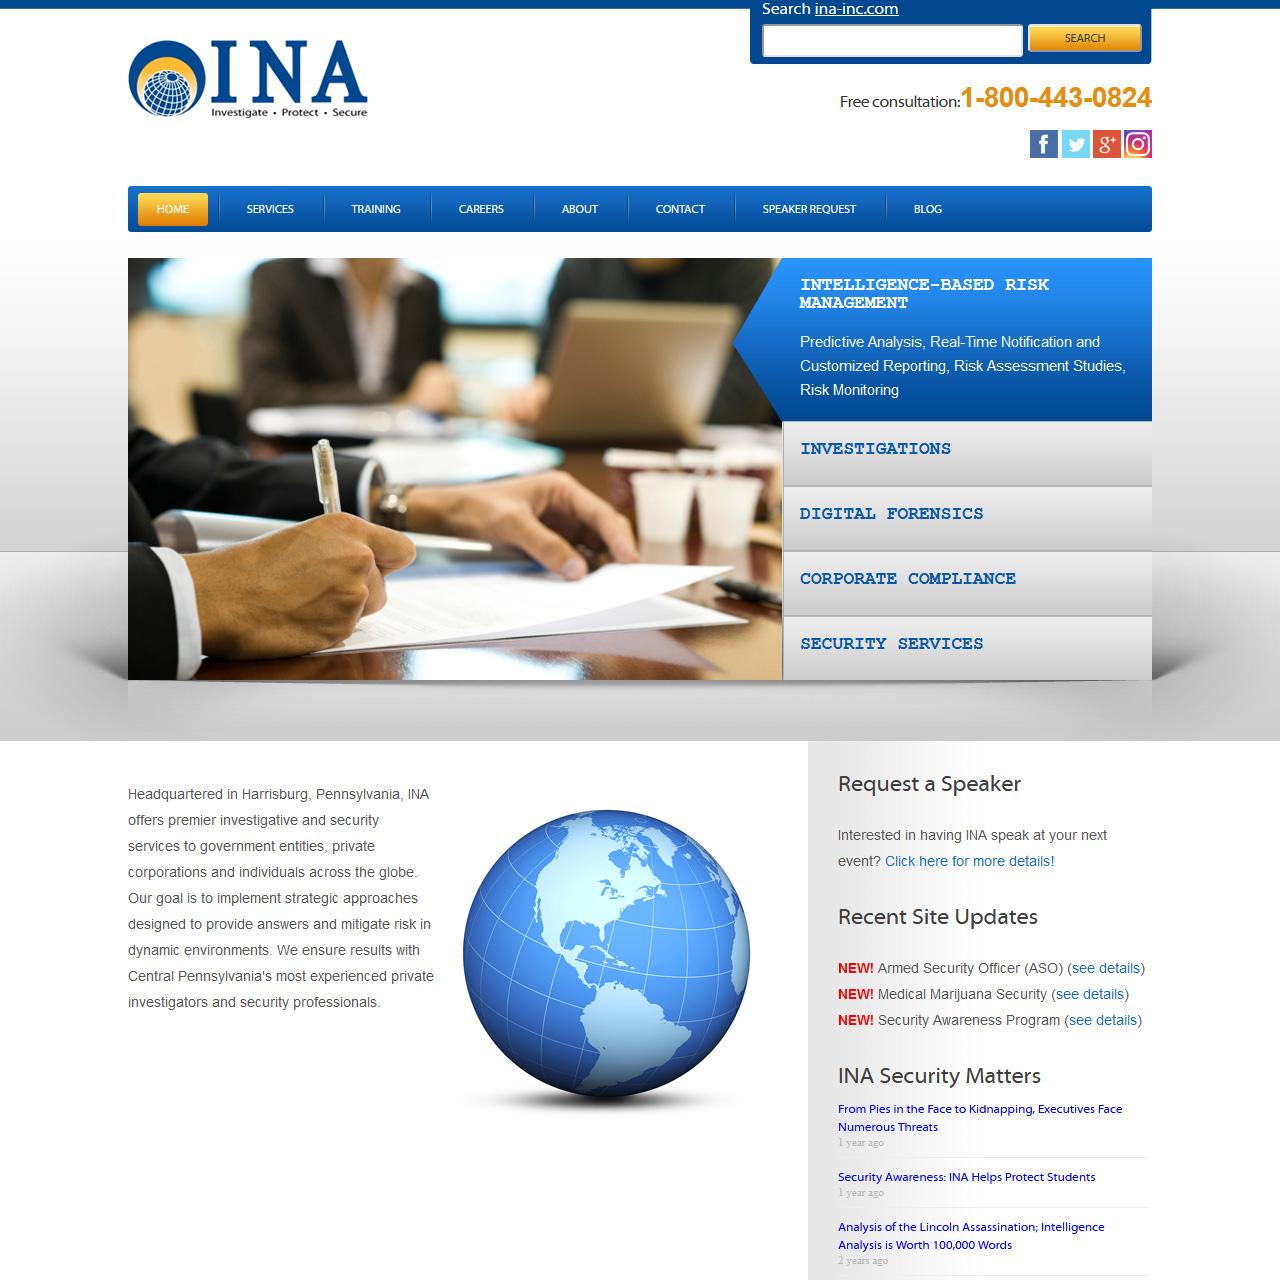 INA INC Private Investigators - private investigators website design